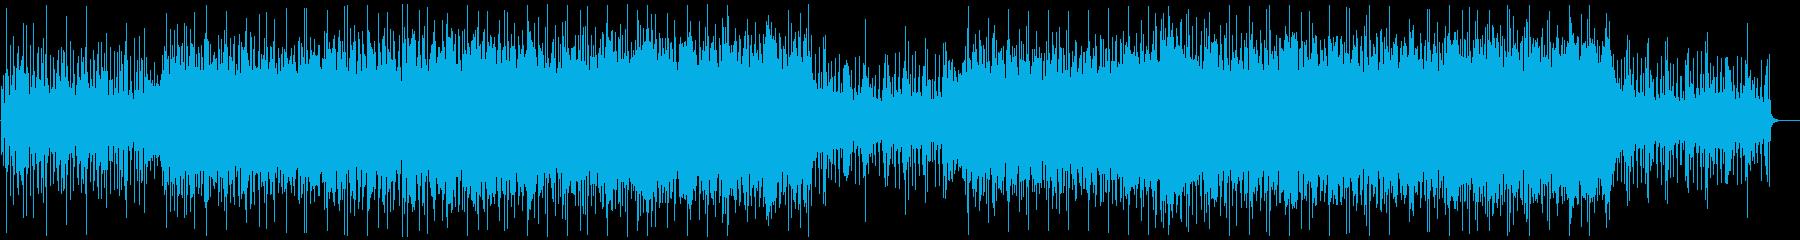 [Cool Western music BGM] Success, determination, decision's reproduced waveform